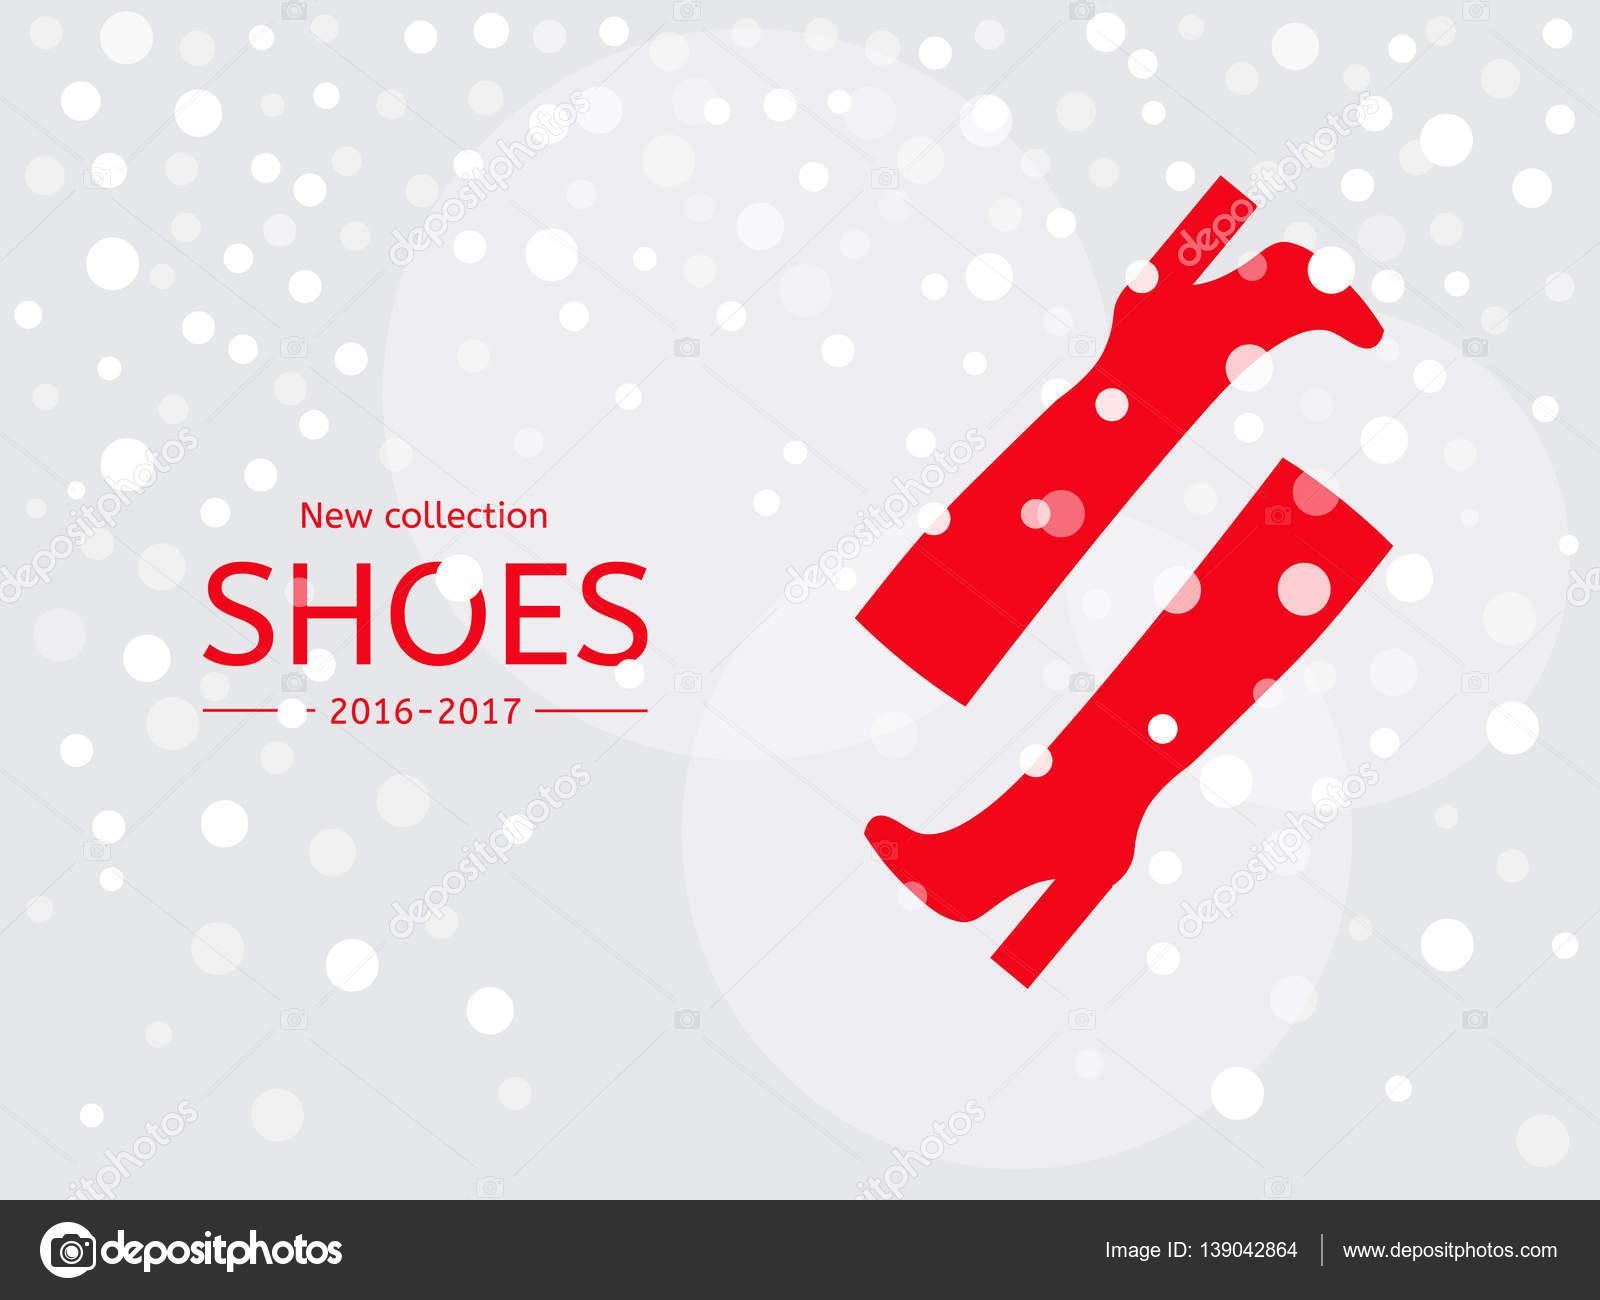 fce5a46fbb8 Κόκκινες γυναικείες μπότες στο παρασκήνιο χιόνι– εικονογράφηση αρχείου